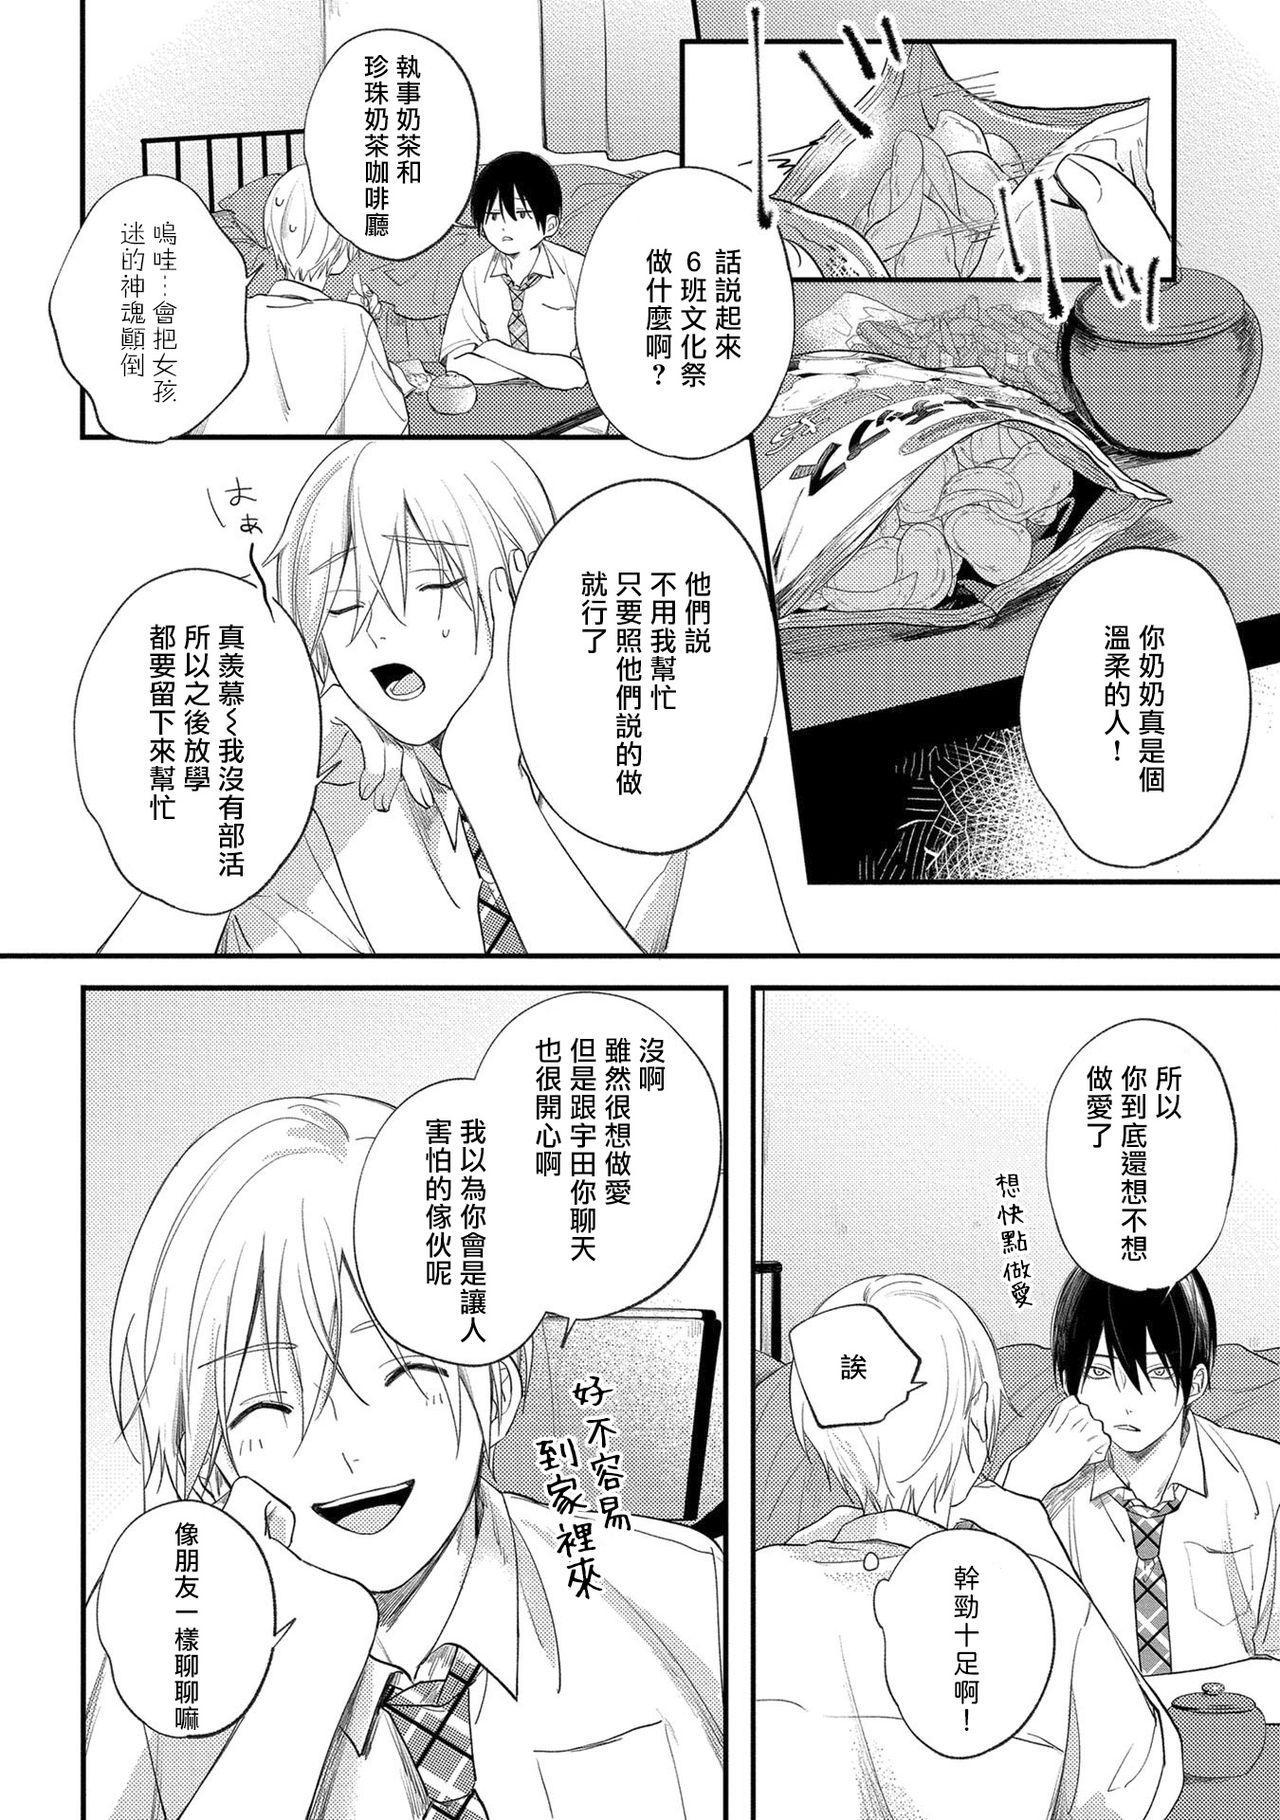 [Utata Hakuto] Houkago Virginity - Virginity afterschool 1-3 [Chinese] [拾荒者汉化组] [Digital] 44